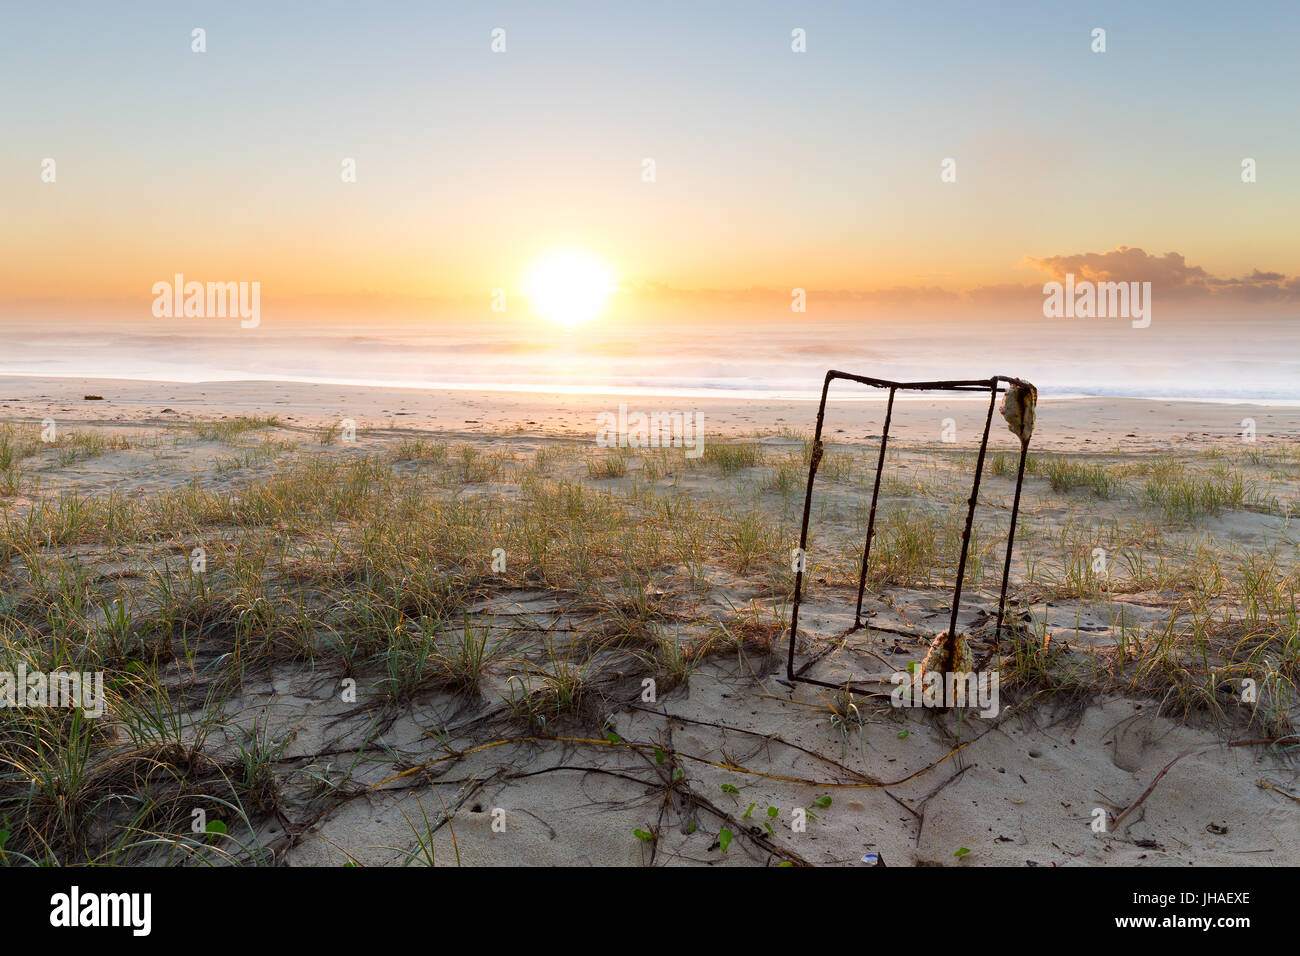 A rusted piece of rectangular ocean litter sits on the beach as the sunrise illuminates the beautiful coastline - Stock Image